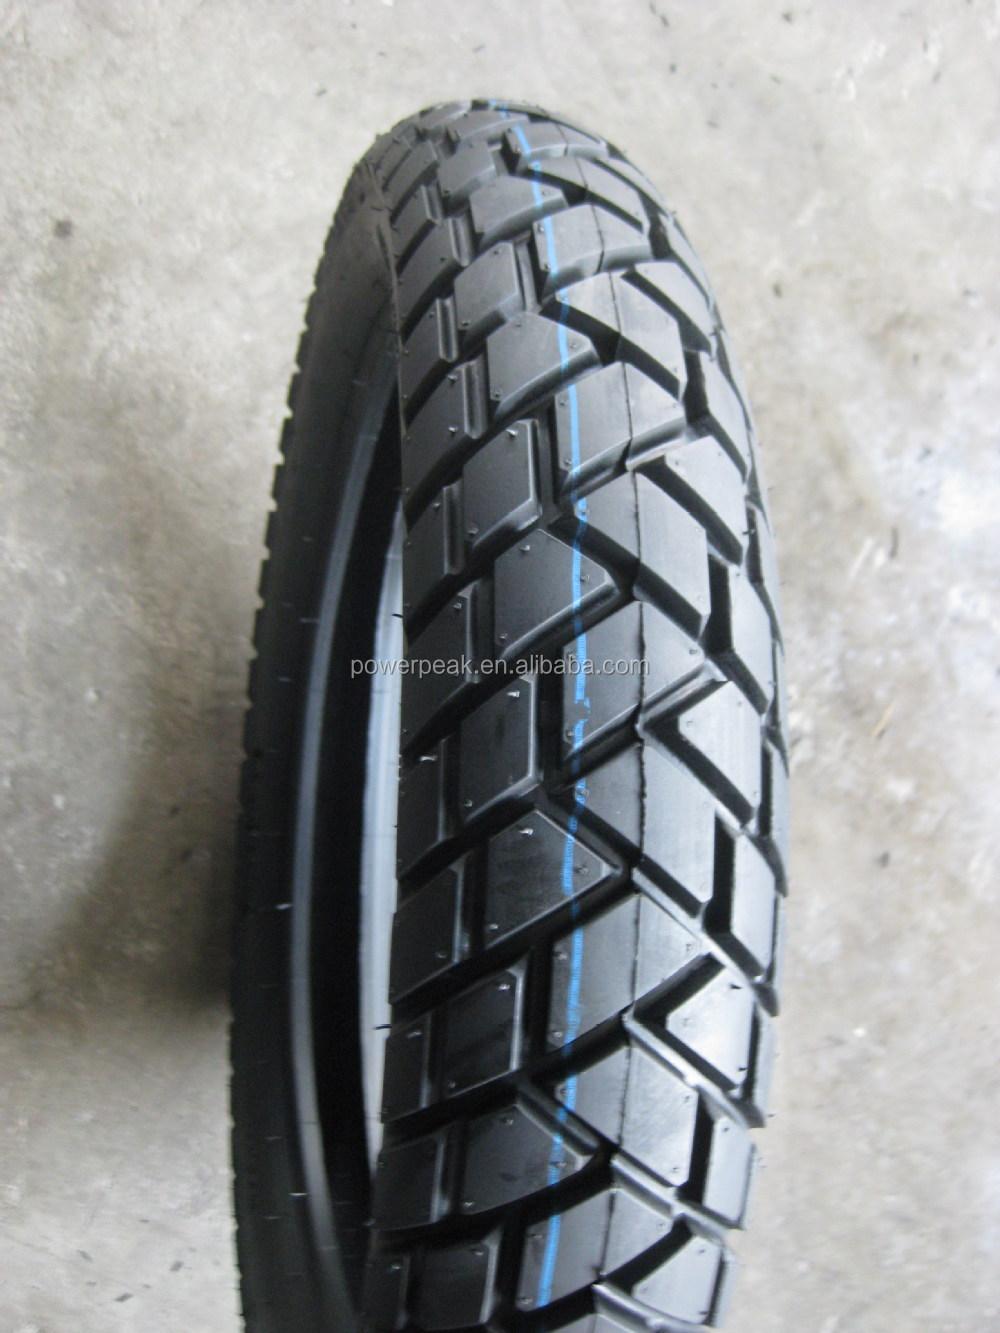 Moto Tires 100 90 17 300 17 275 17 300 17 Tires Motor